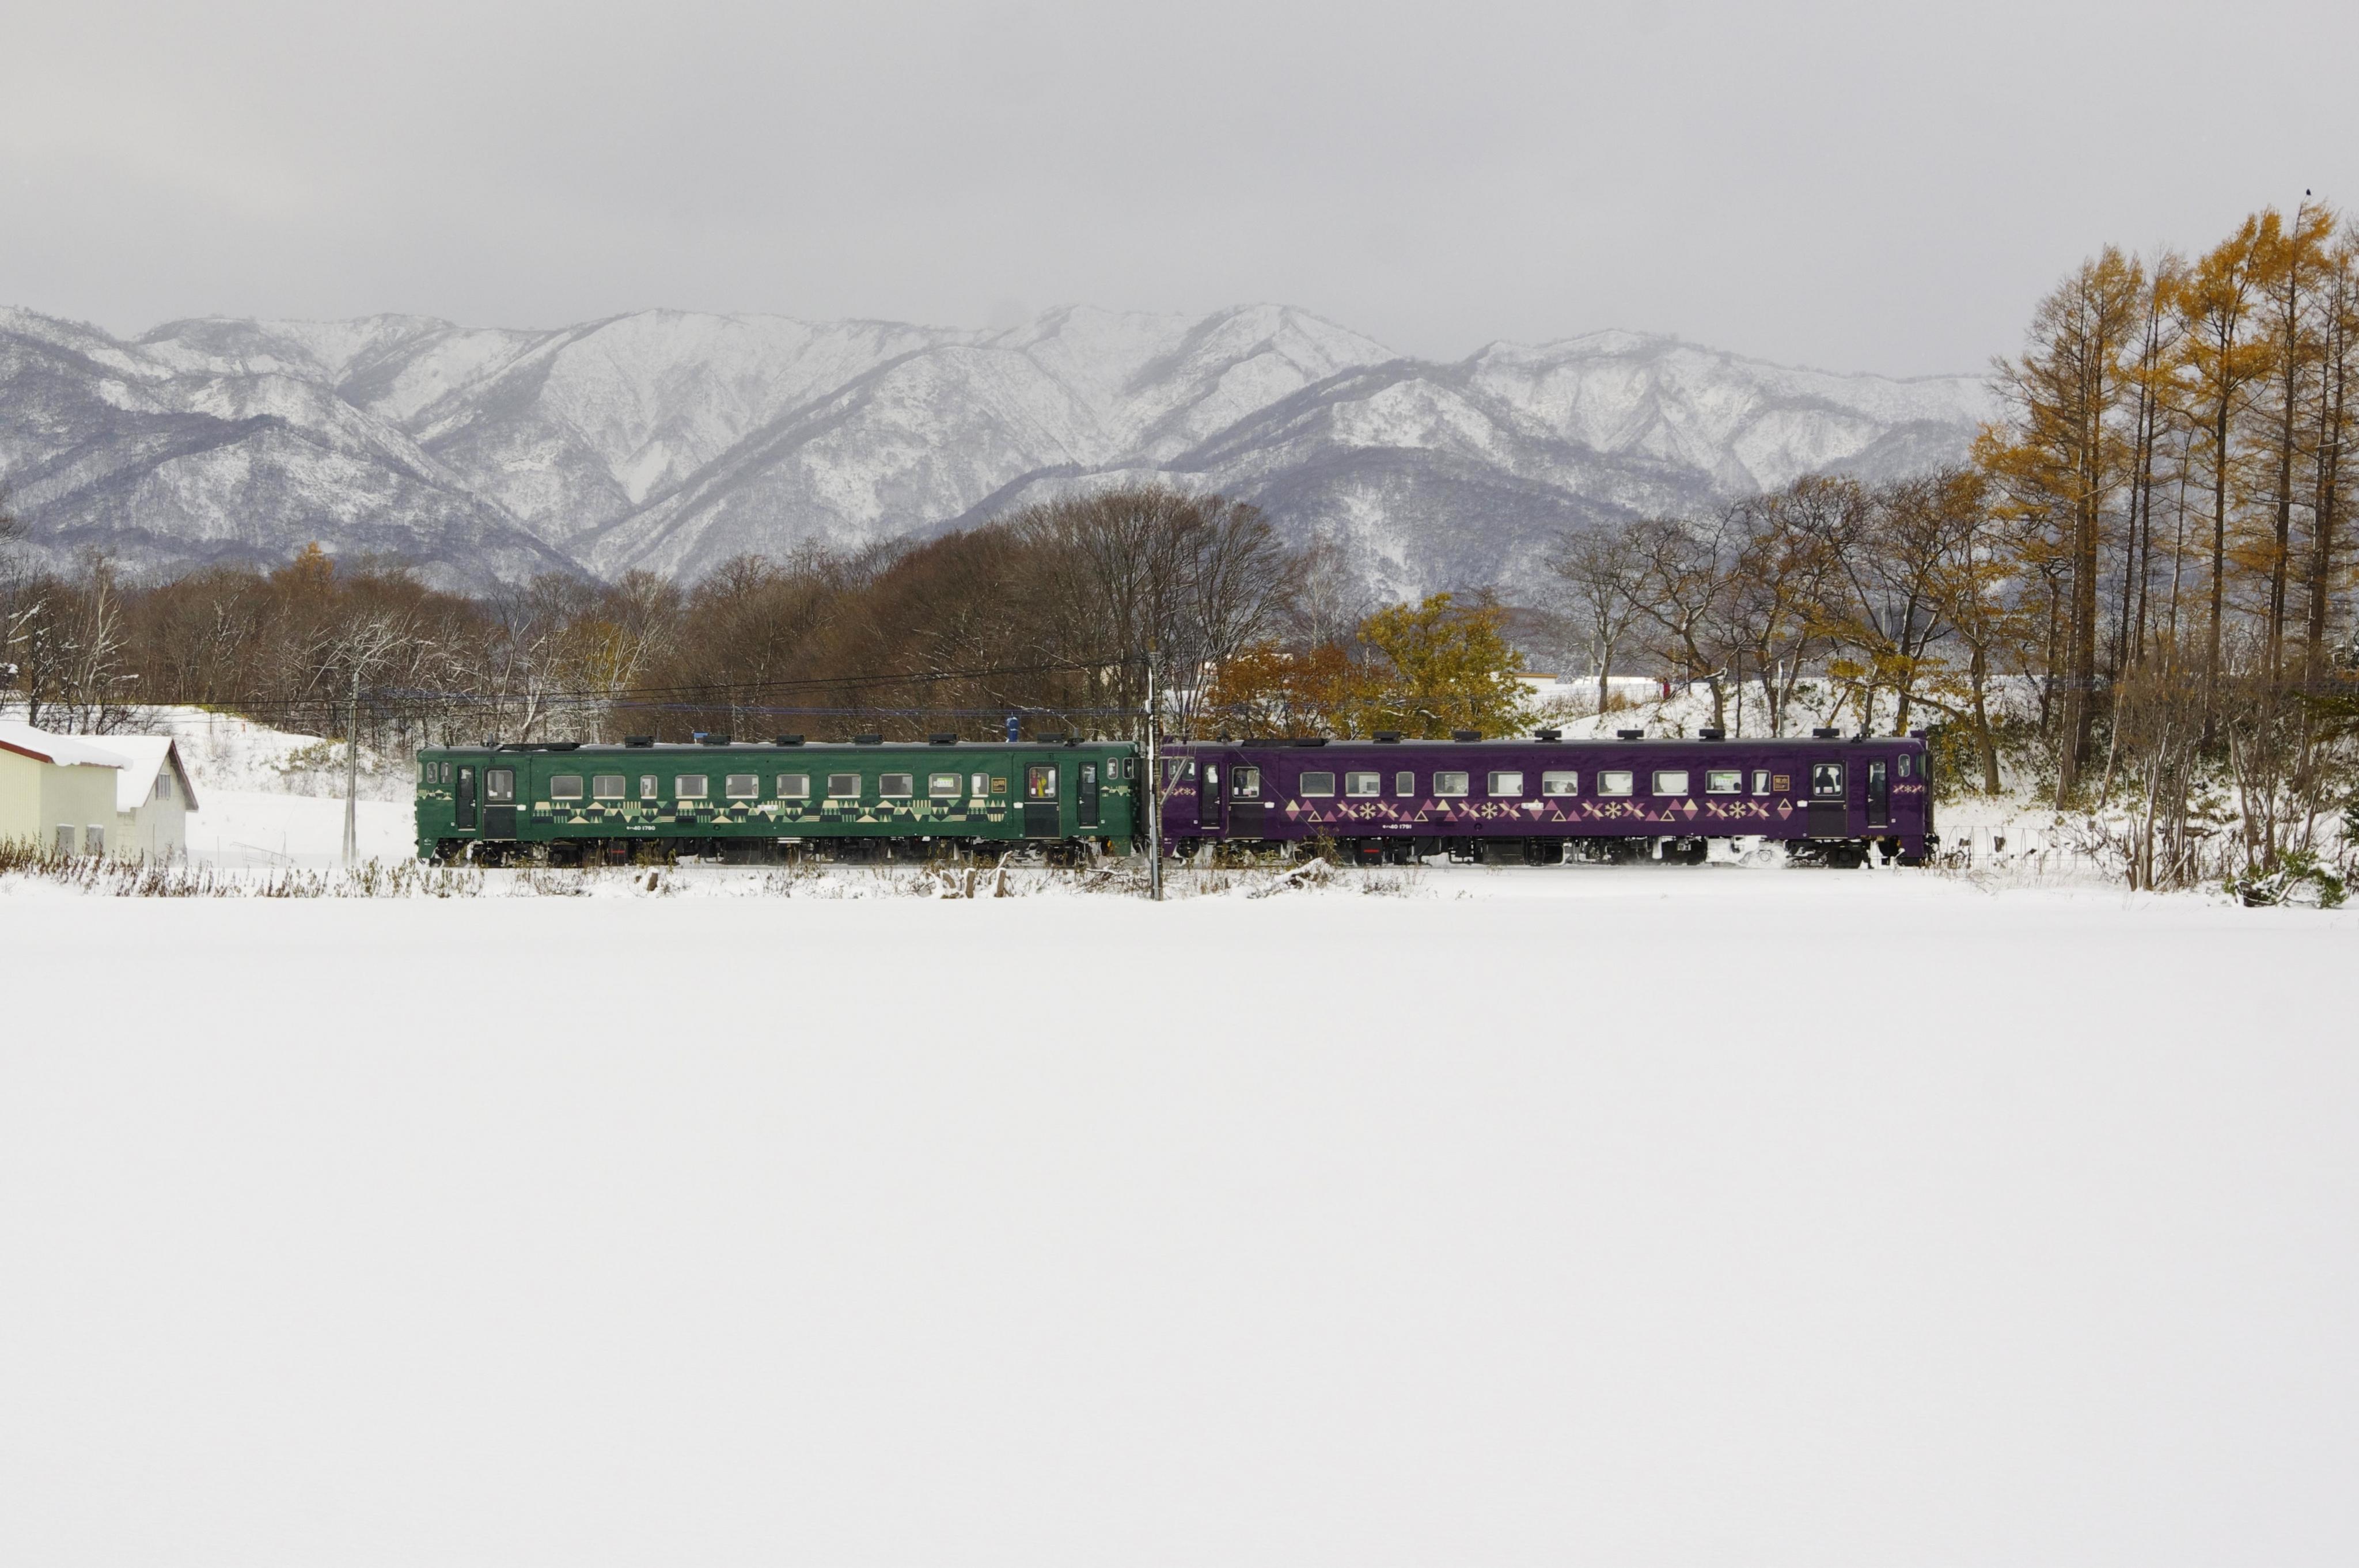 キハ40 紫水山明号 晩生内−札的 191117-2.jpg